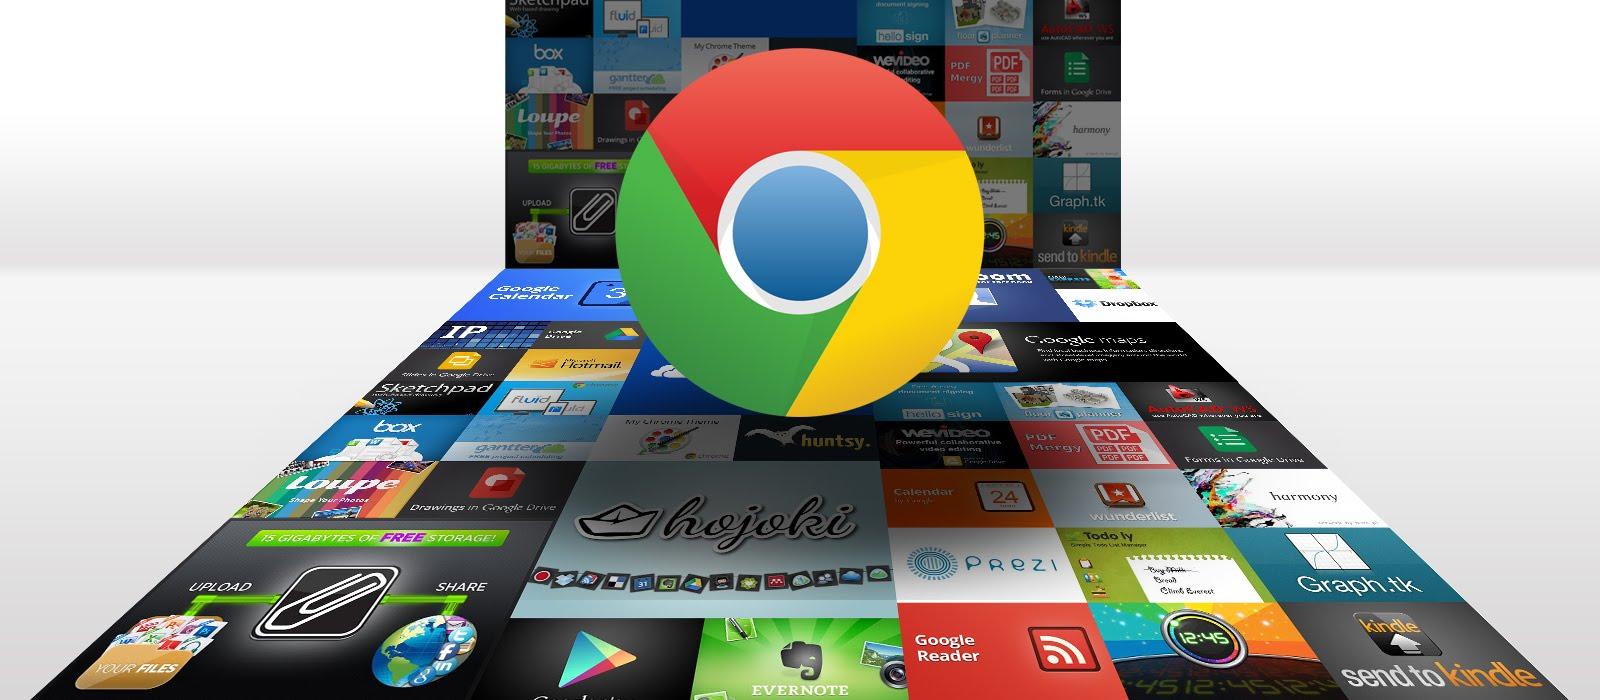 Google_Chrome_Extensions